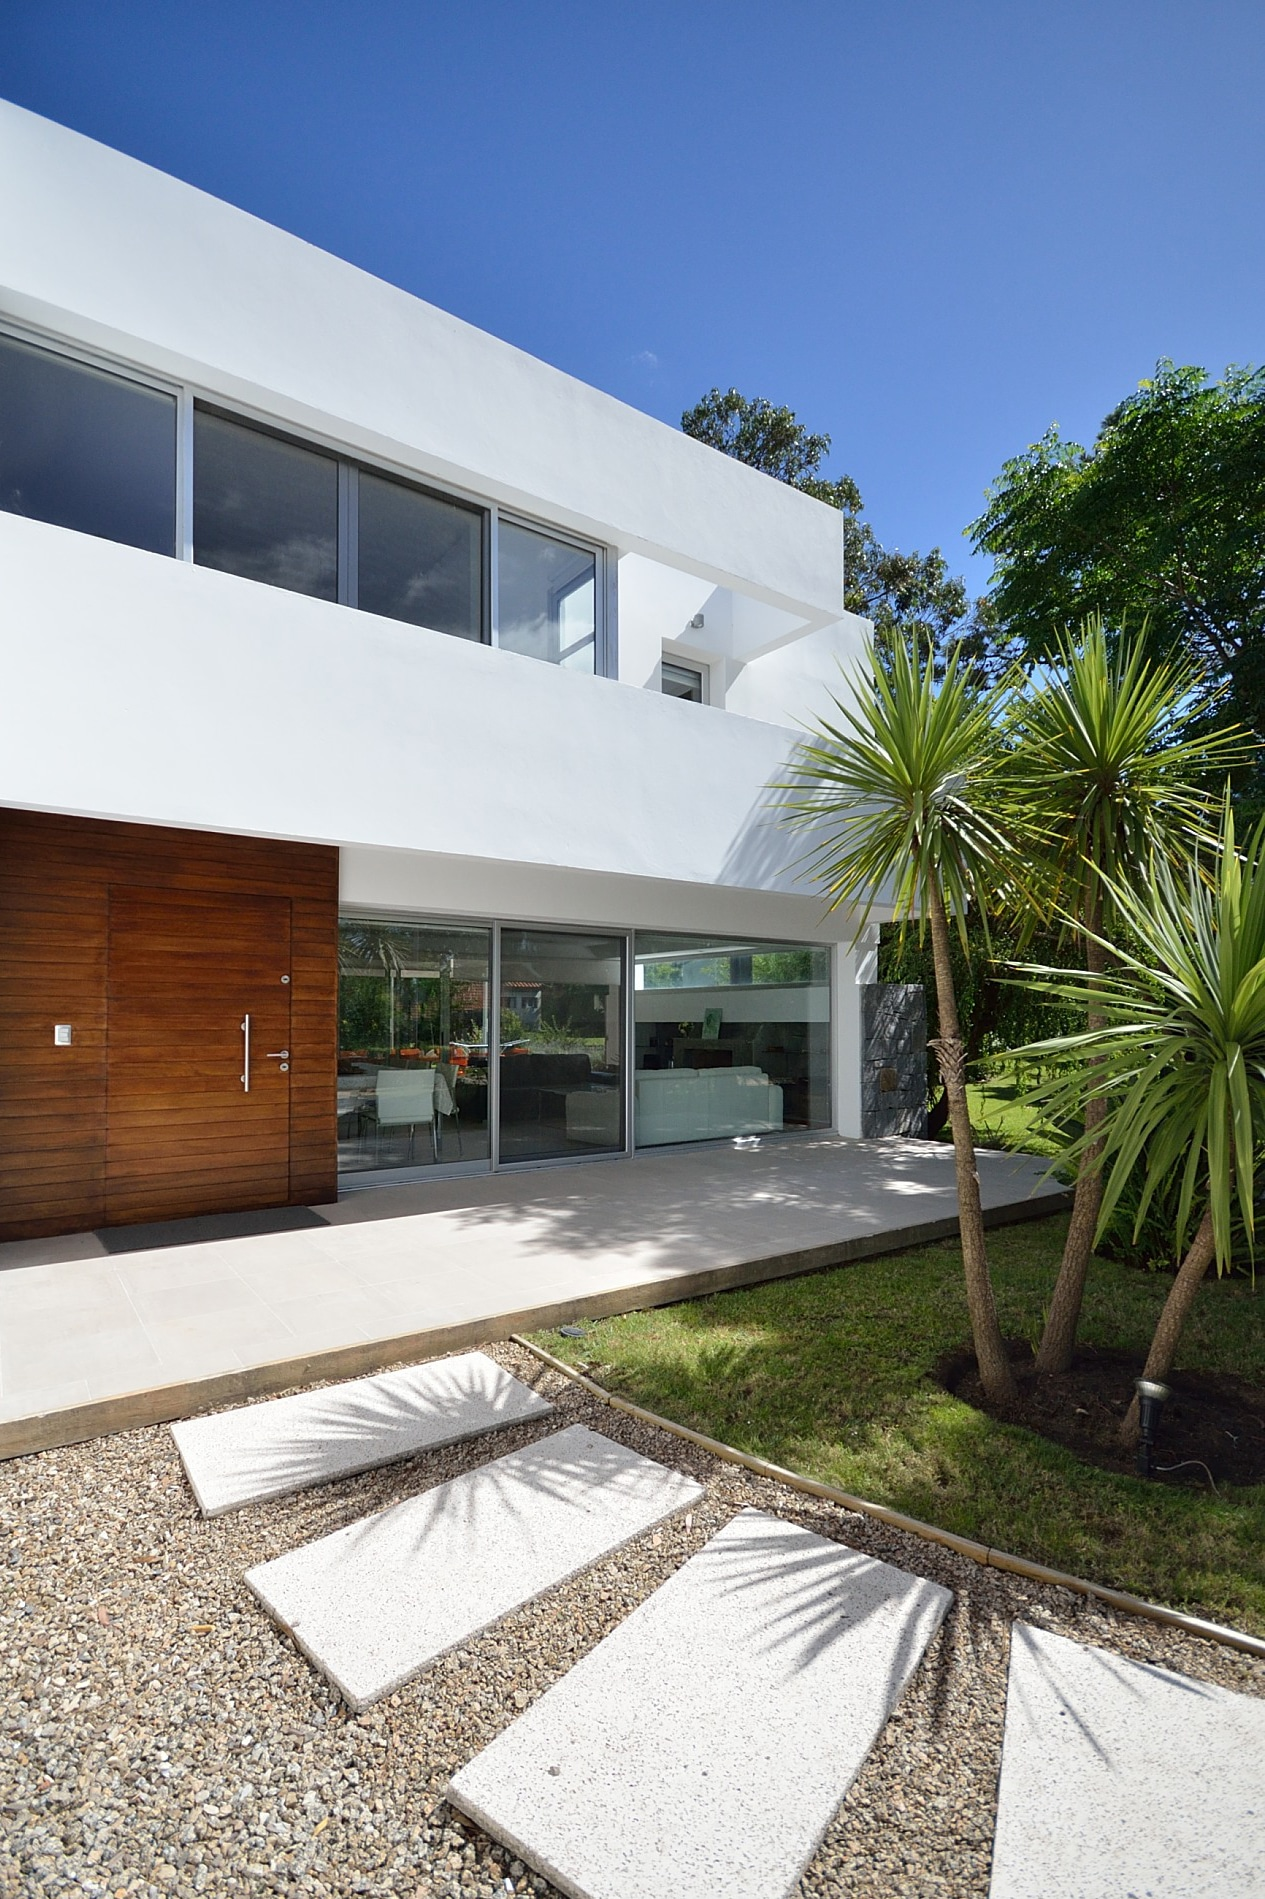 Casa brava house canexel - Casas de madera blancas ...